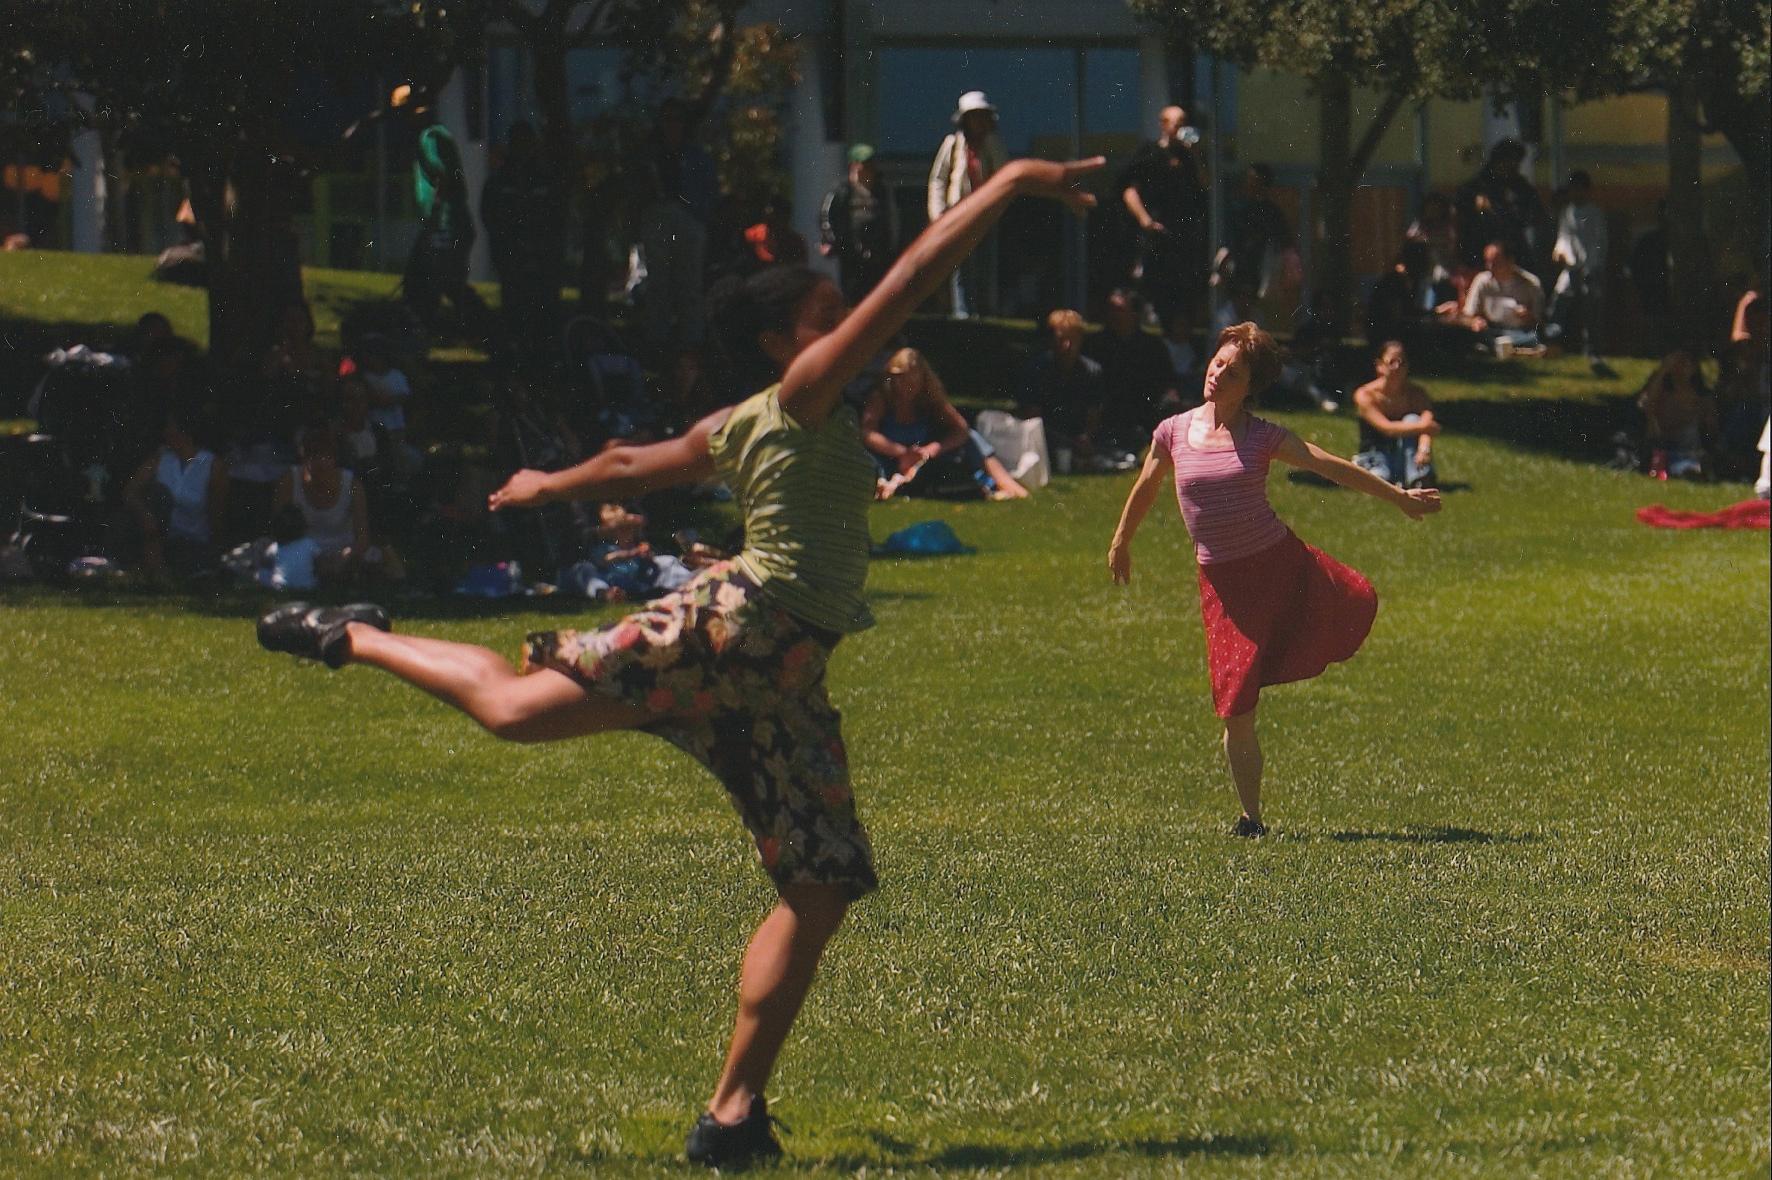 La Processione, Yerba Buena Gardens